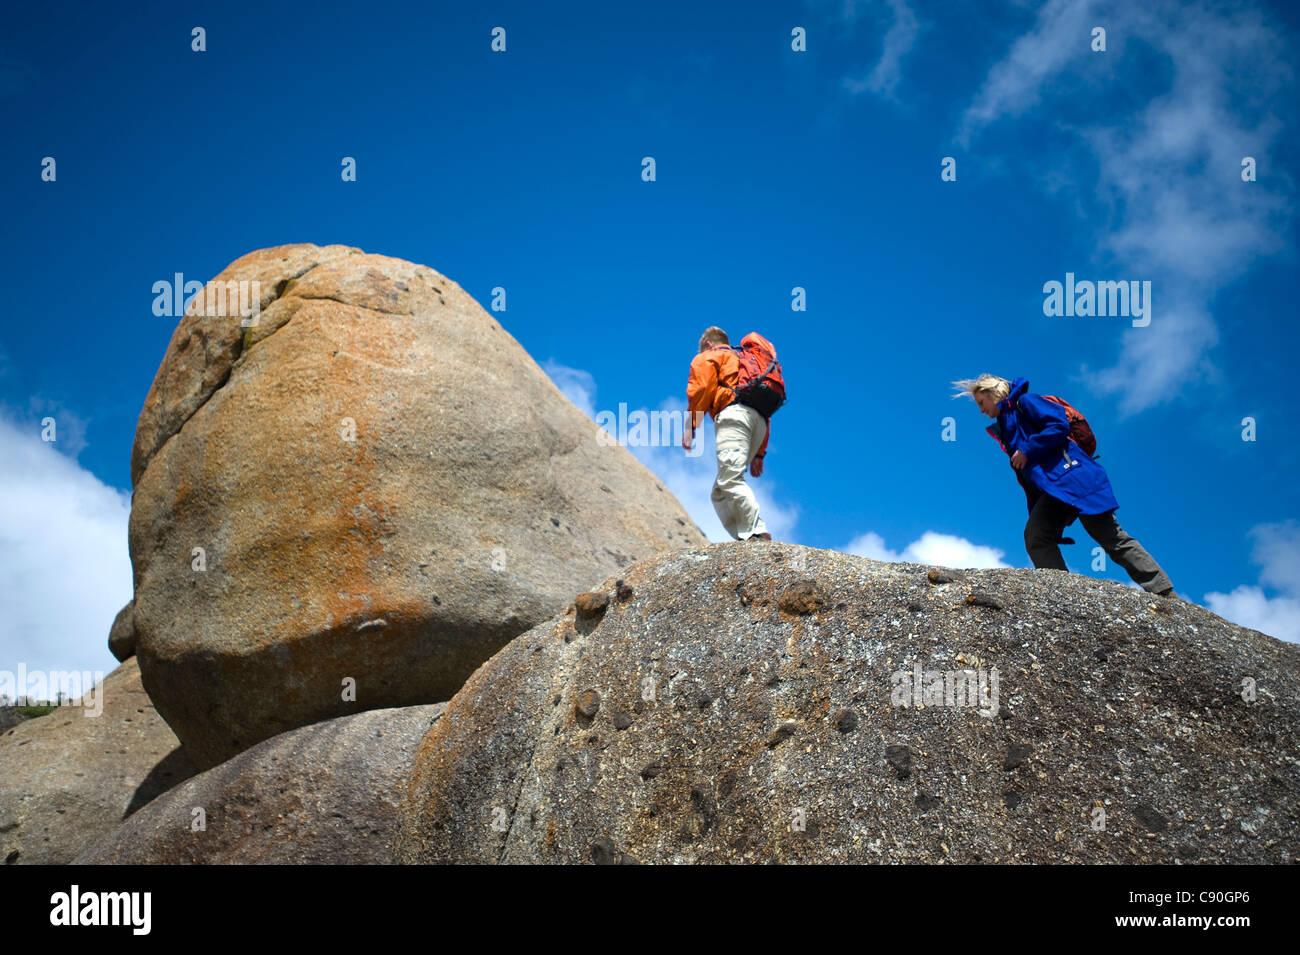 Les roches de granit, Whisky Bay, Wilsons Promontory National Park, Victoria, Australie Photo Stock